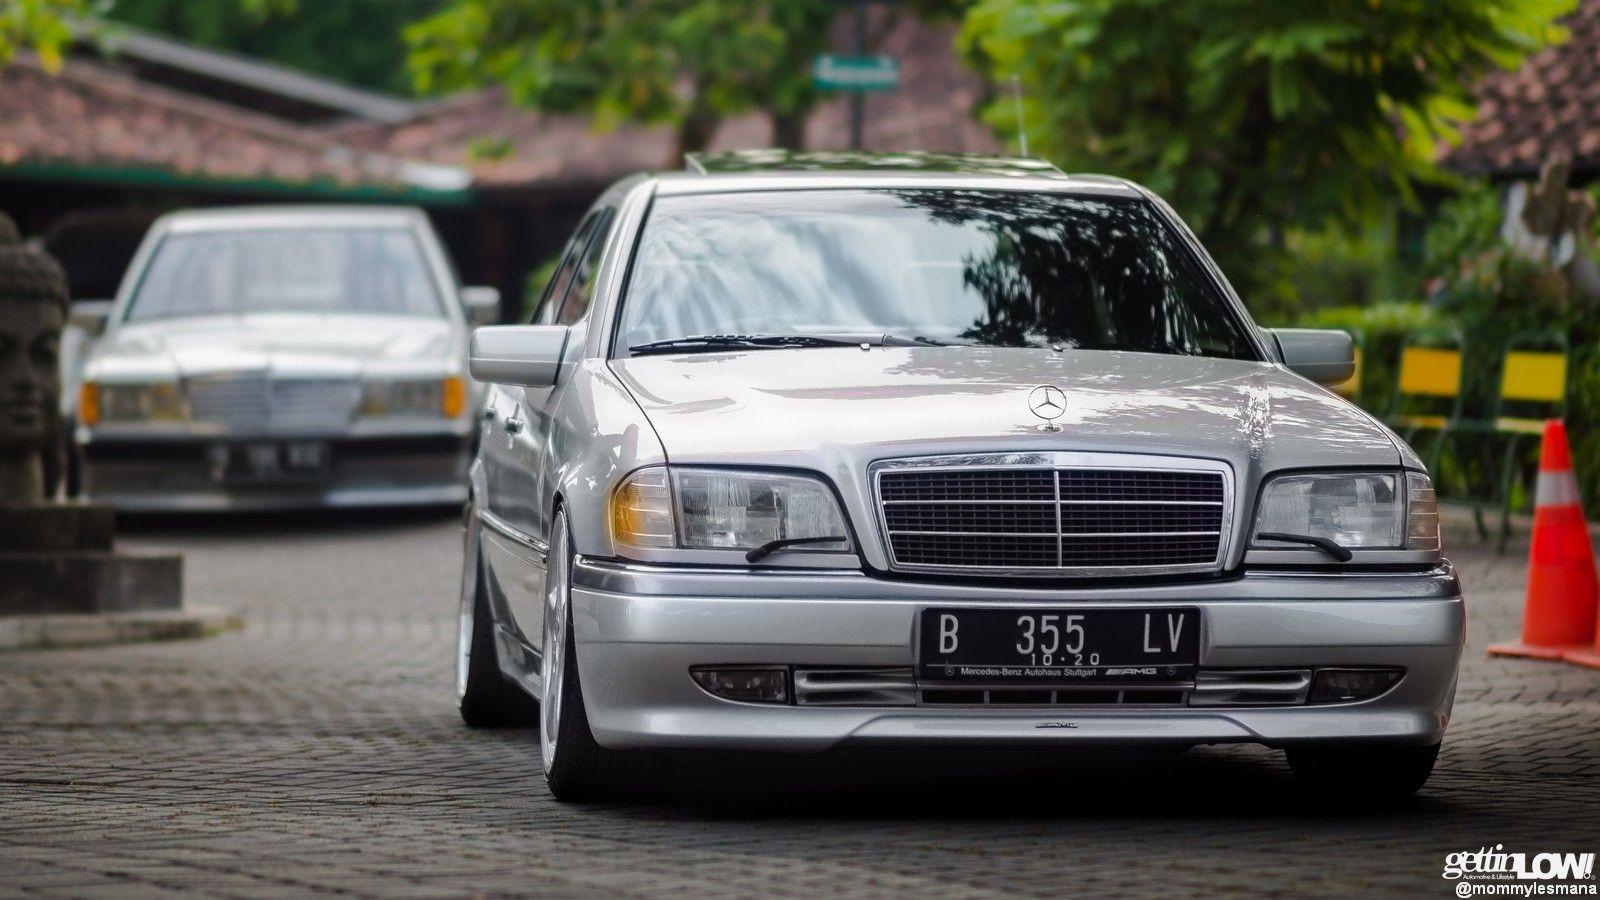 Trey Coesno 1995 Mercedes Benz W202 C200 Full Amg Gettinlow Di 2021 Mercedes Benz Mercedes Mobil